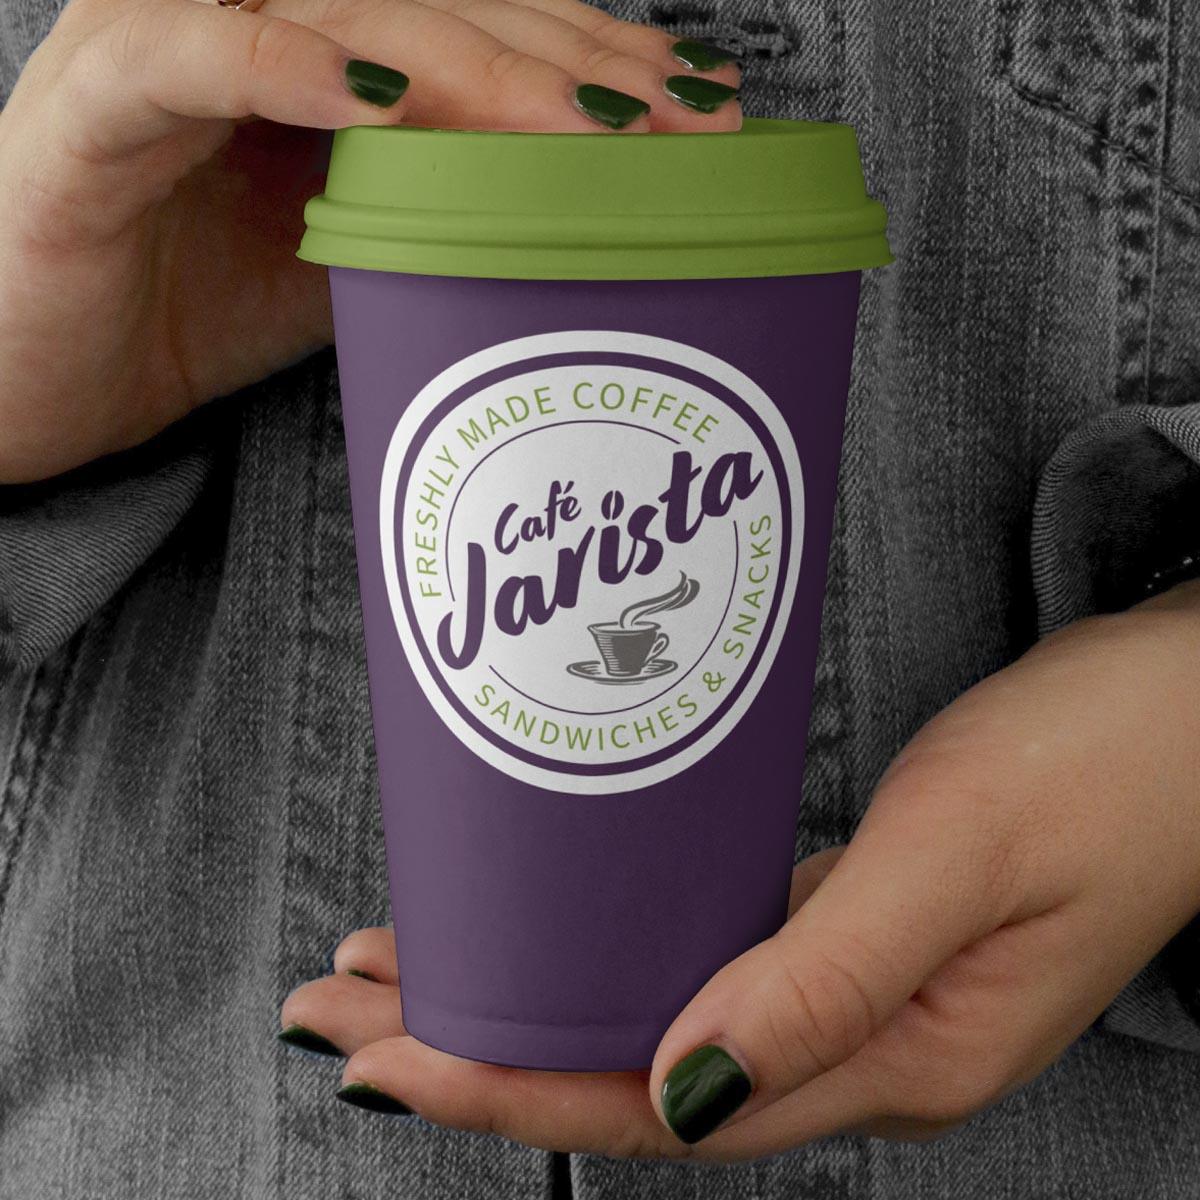 Café Jarista branded coffee cup